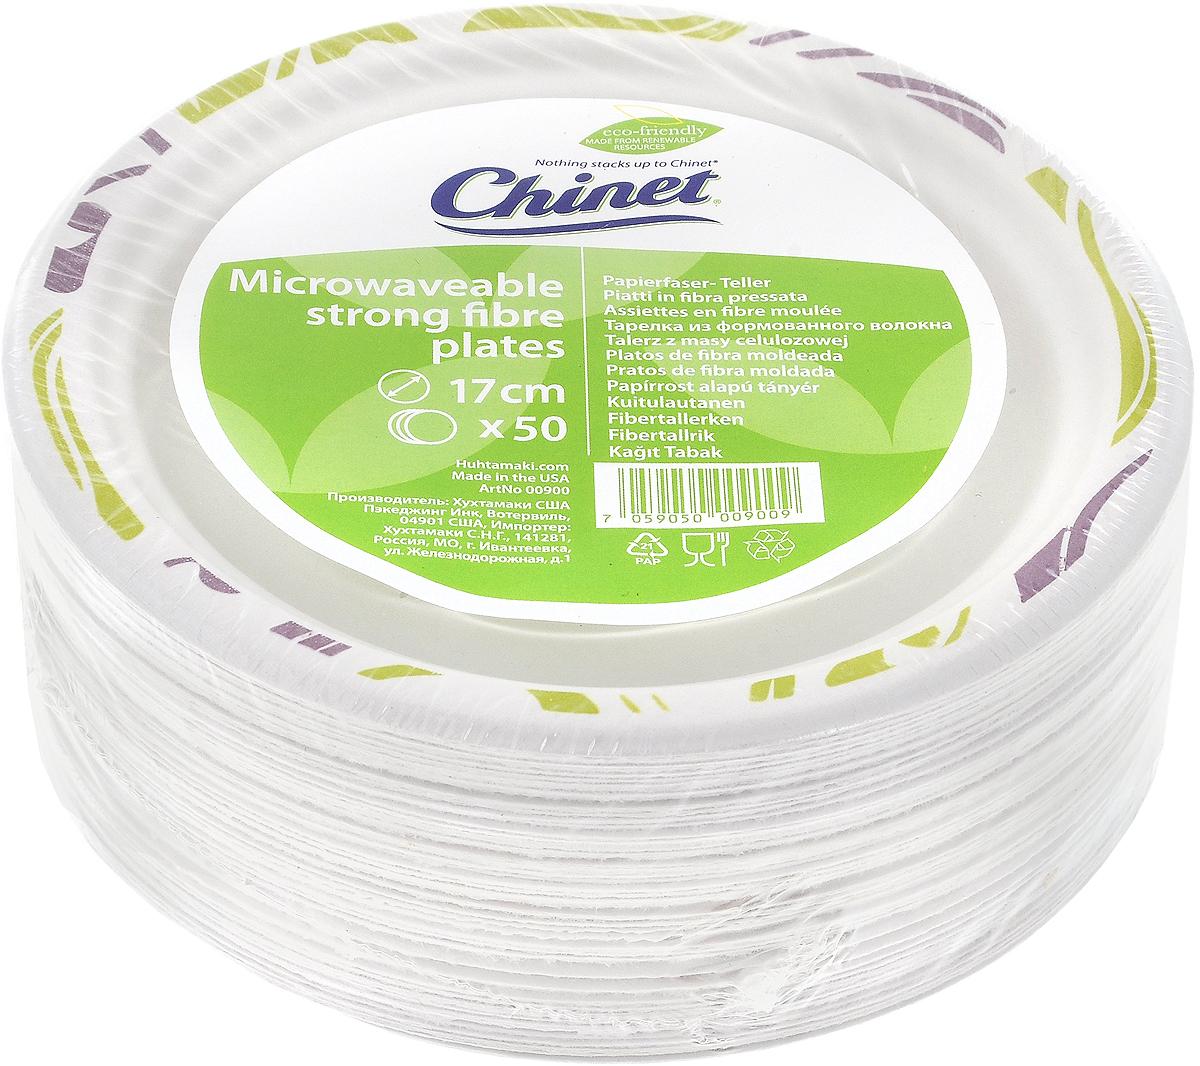 "Набор одноразовых тарелок Huhtamaki ""Chinet"", диаметр 17 см, 50 шт ПОС31575"